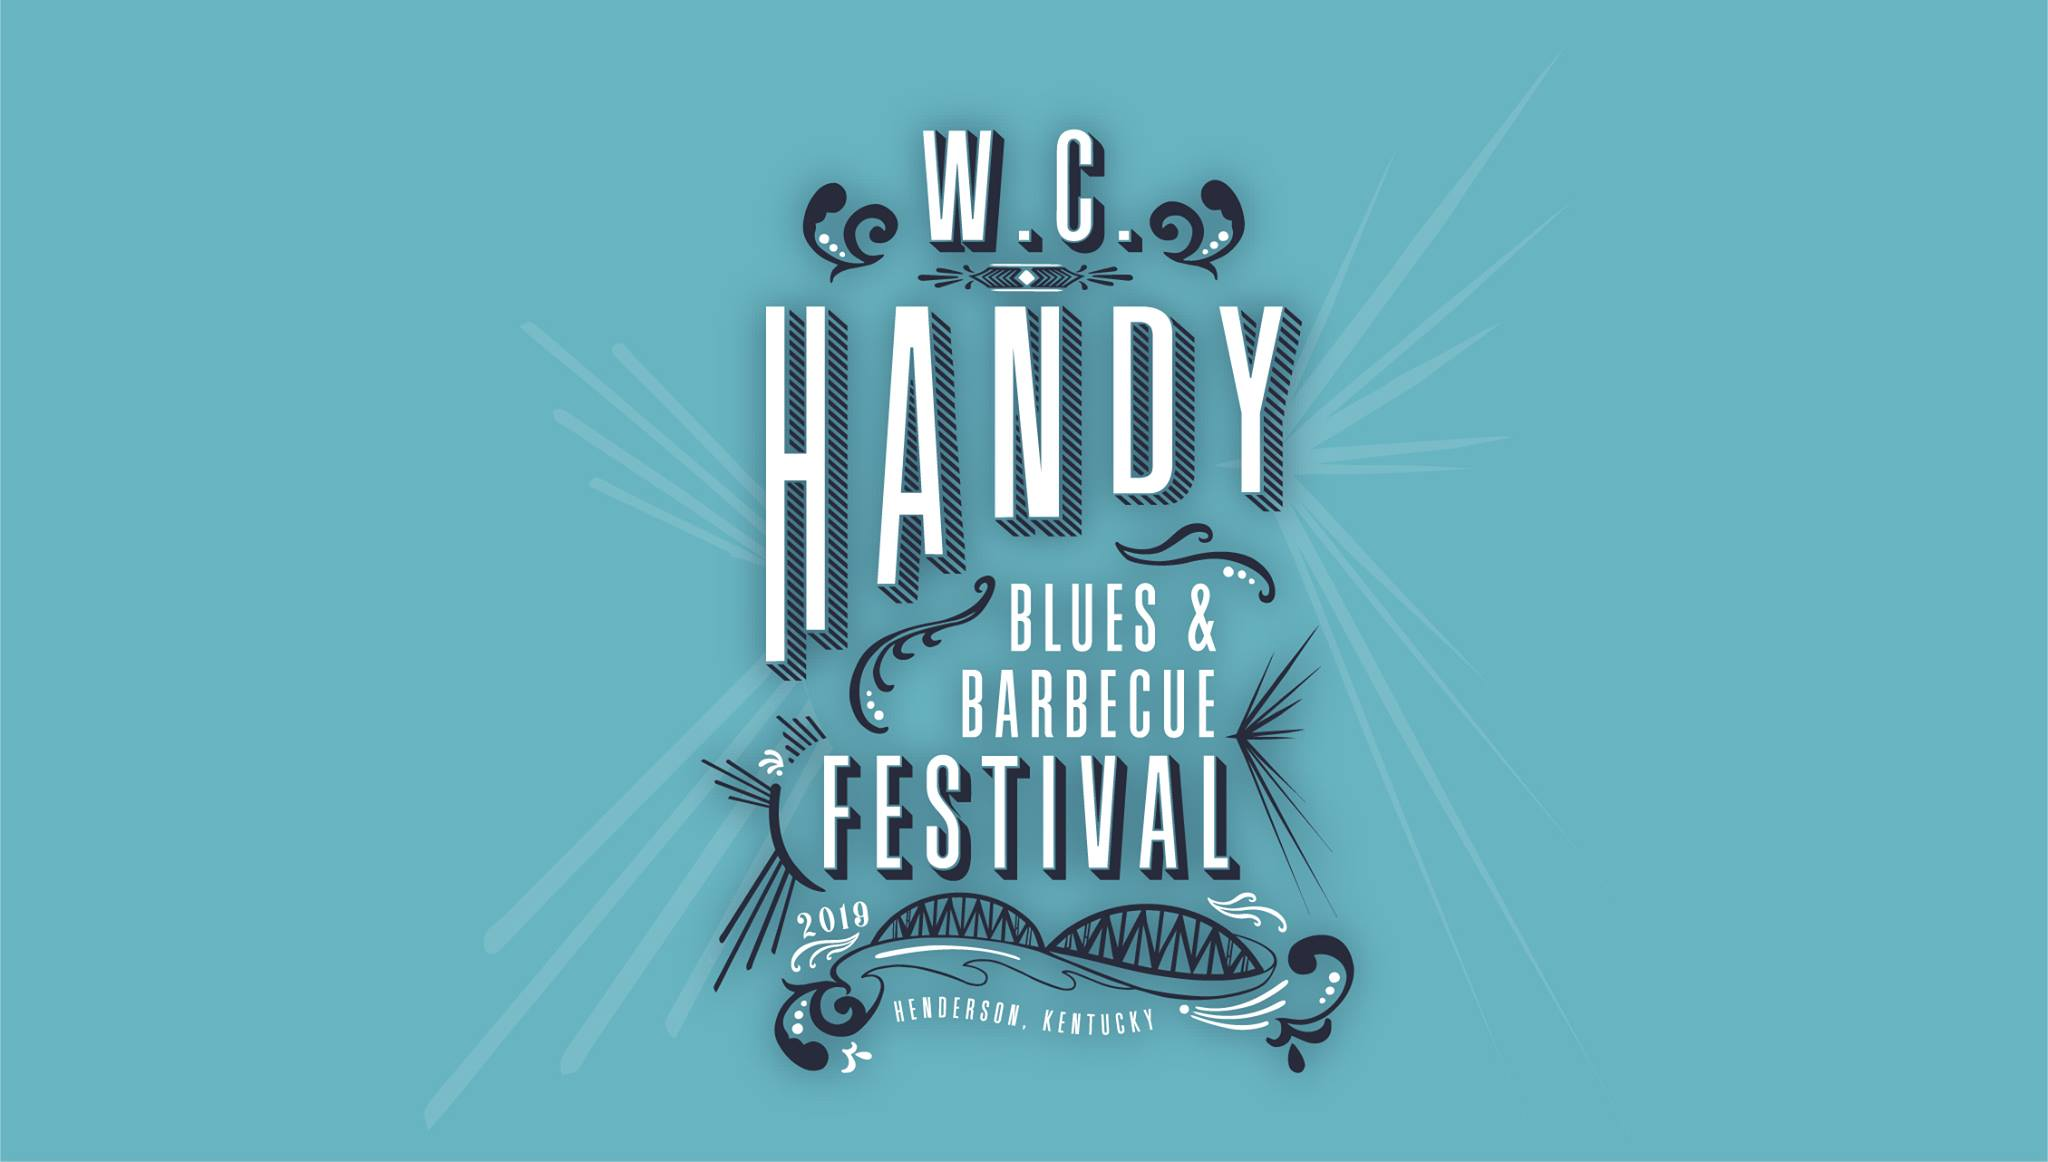 wc-handy-blues-festival.jpg